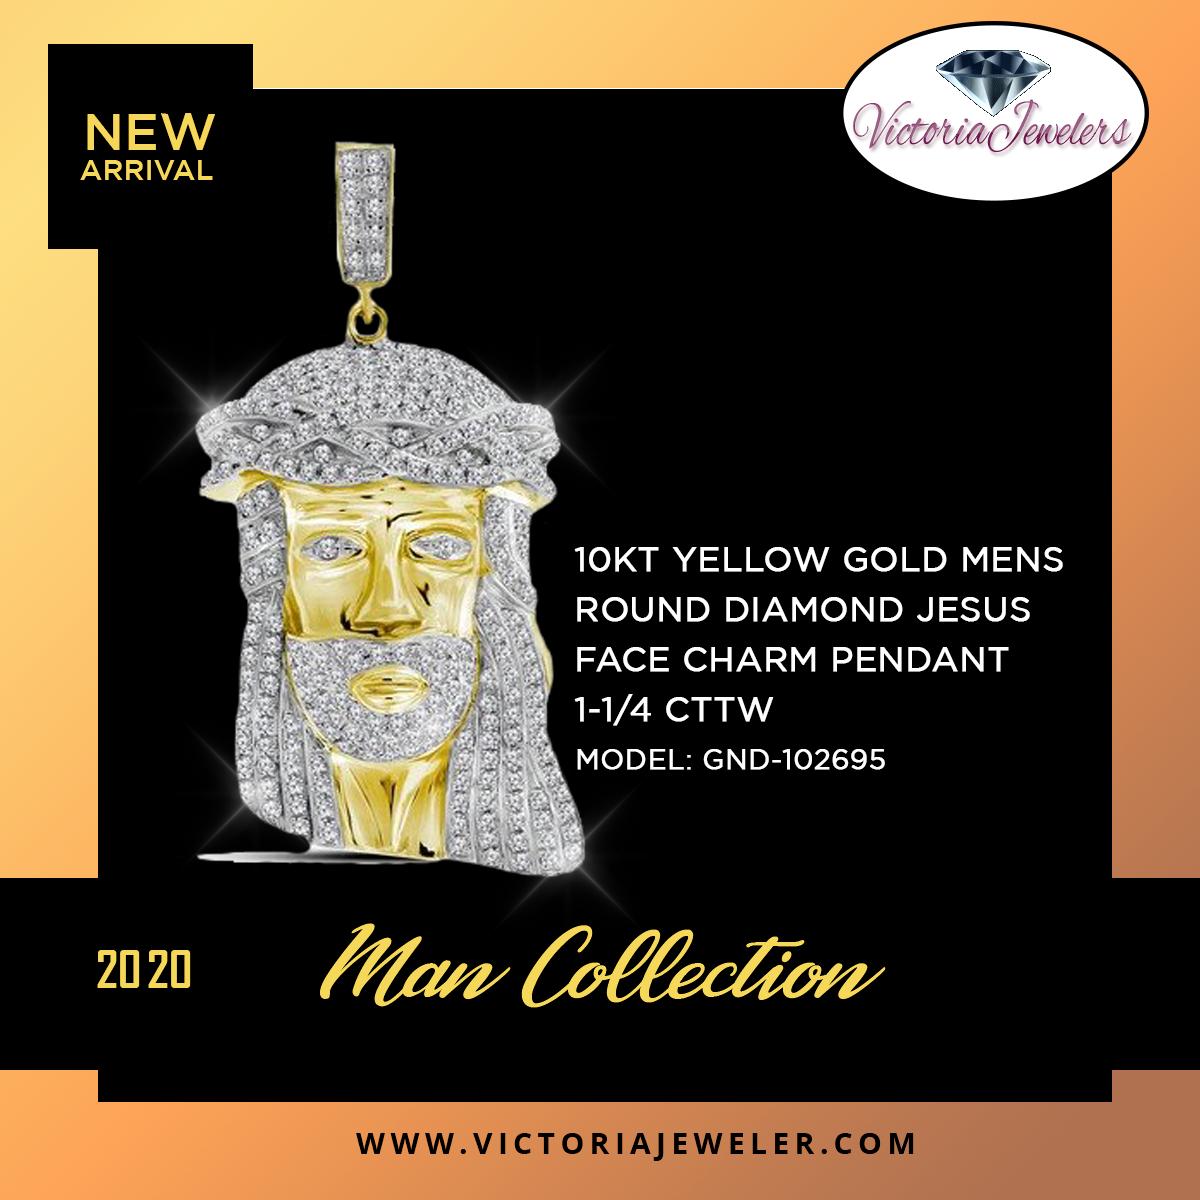 10kt Yellow Gold Mens Round Diamond Jesus Face Charm Pendant 1 1 4 Cttw In 2020 Diamond Jesus Charm Pendant Jesus Face